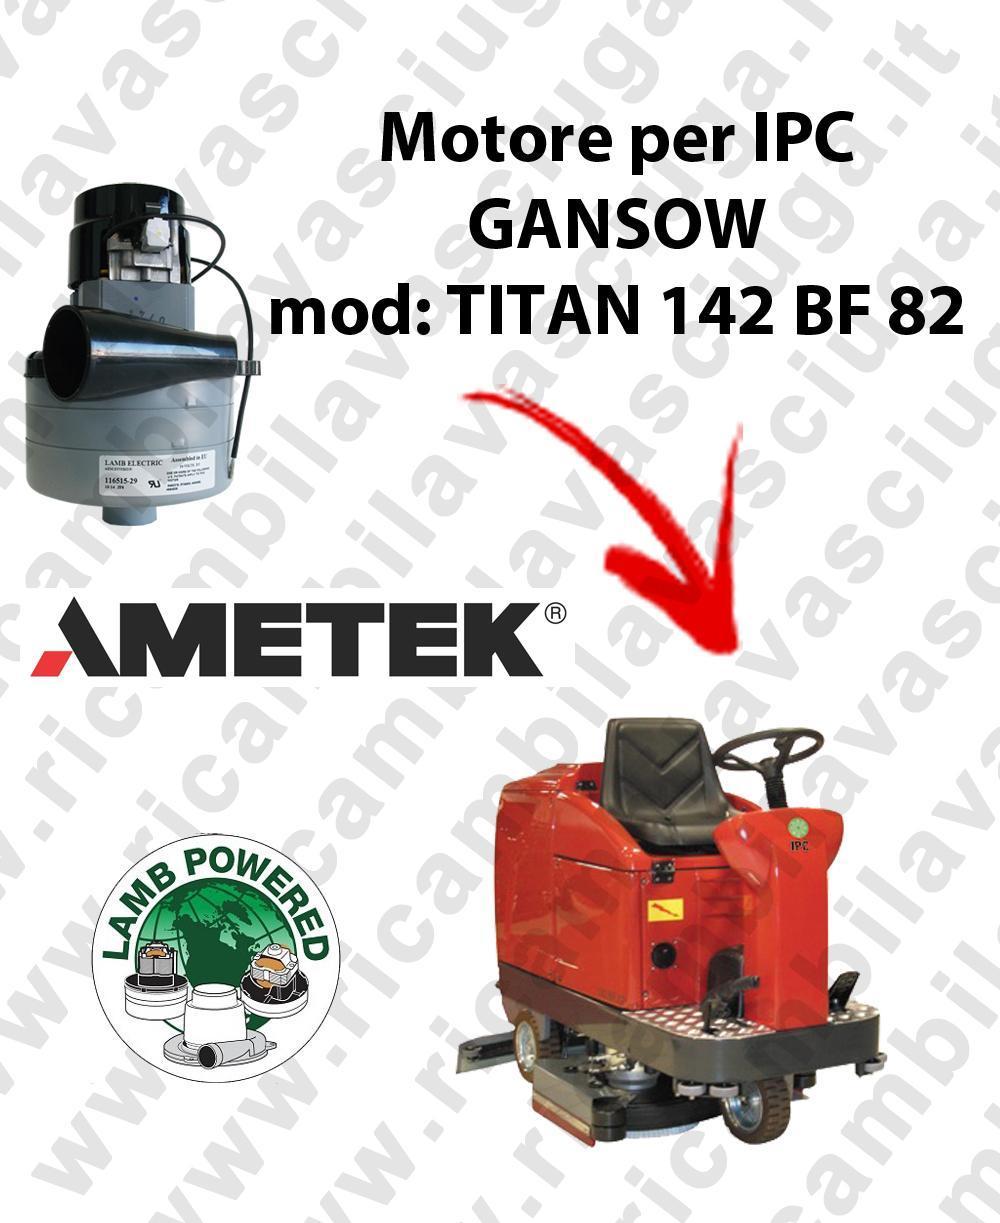 TITAN 142 BF 82 Saugmotor LAMB AMETEK für scheuersaugmaschinen IPC GANSOW